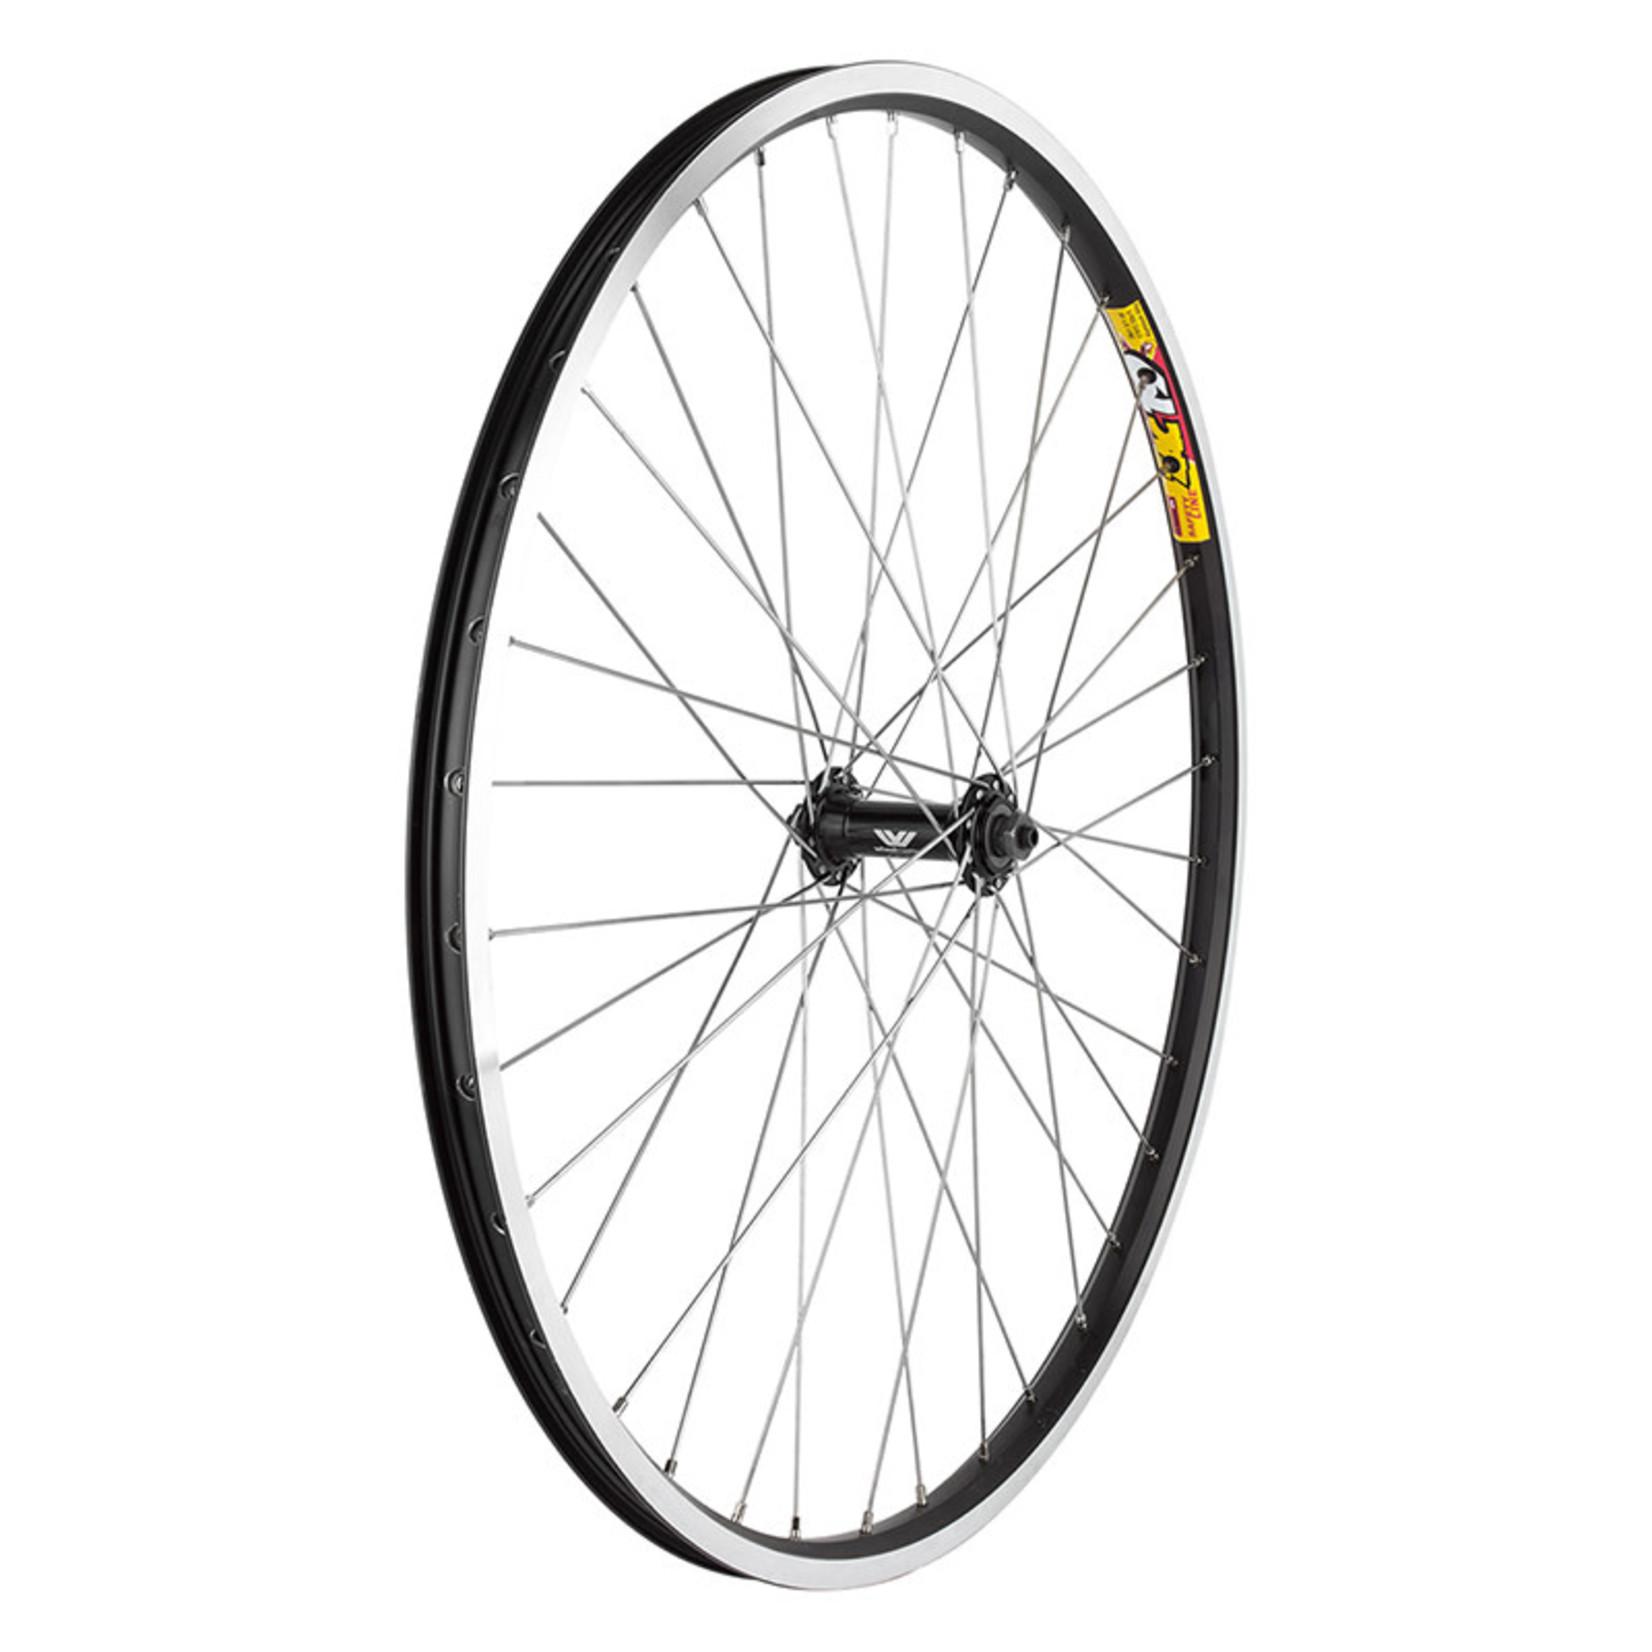 "26"" Front Wheel Alloy Mountain Double Wall QR Black w/MSW"